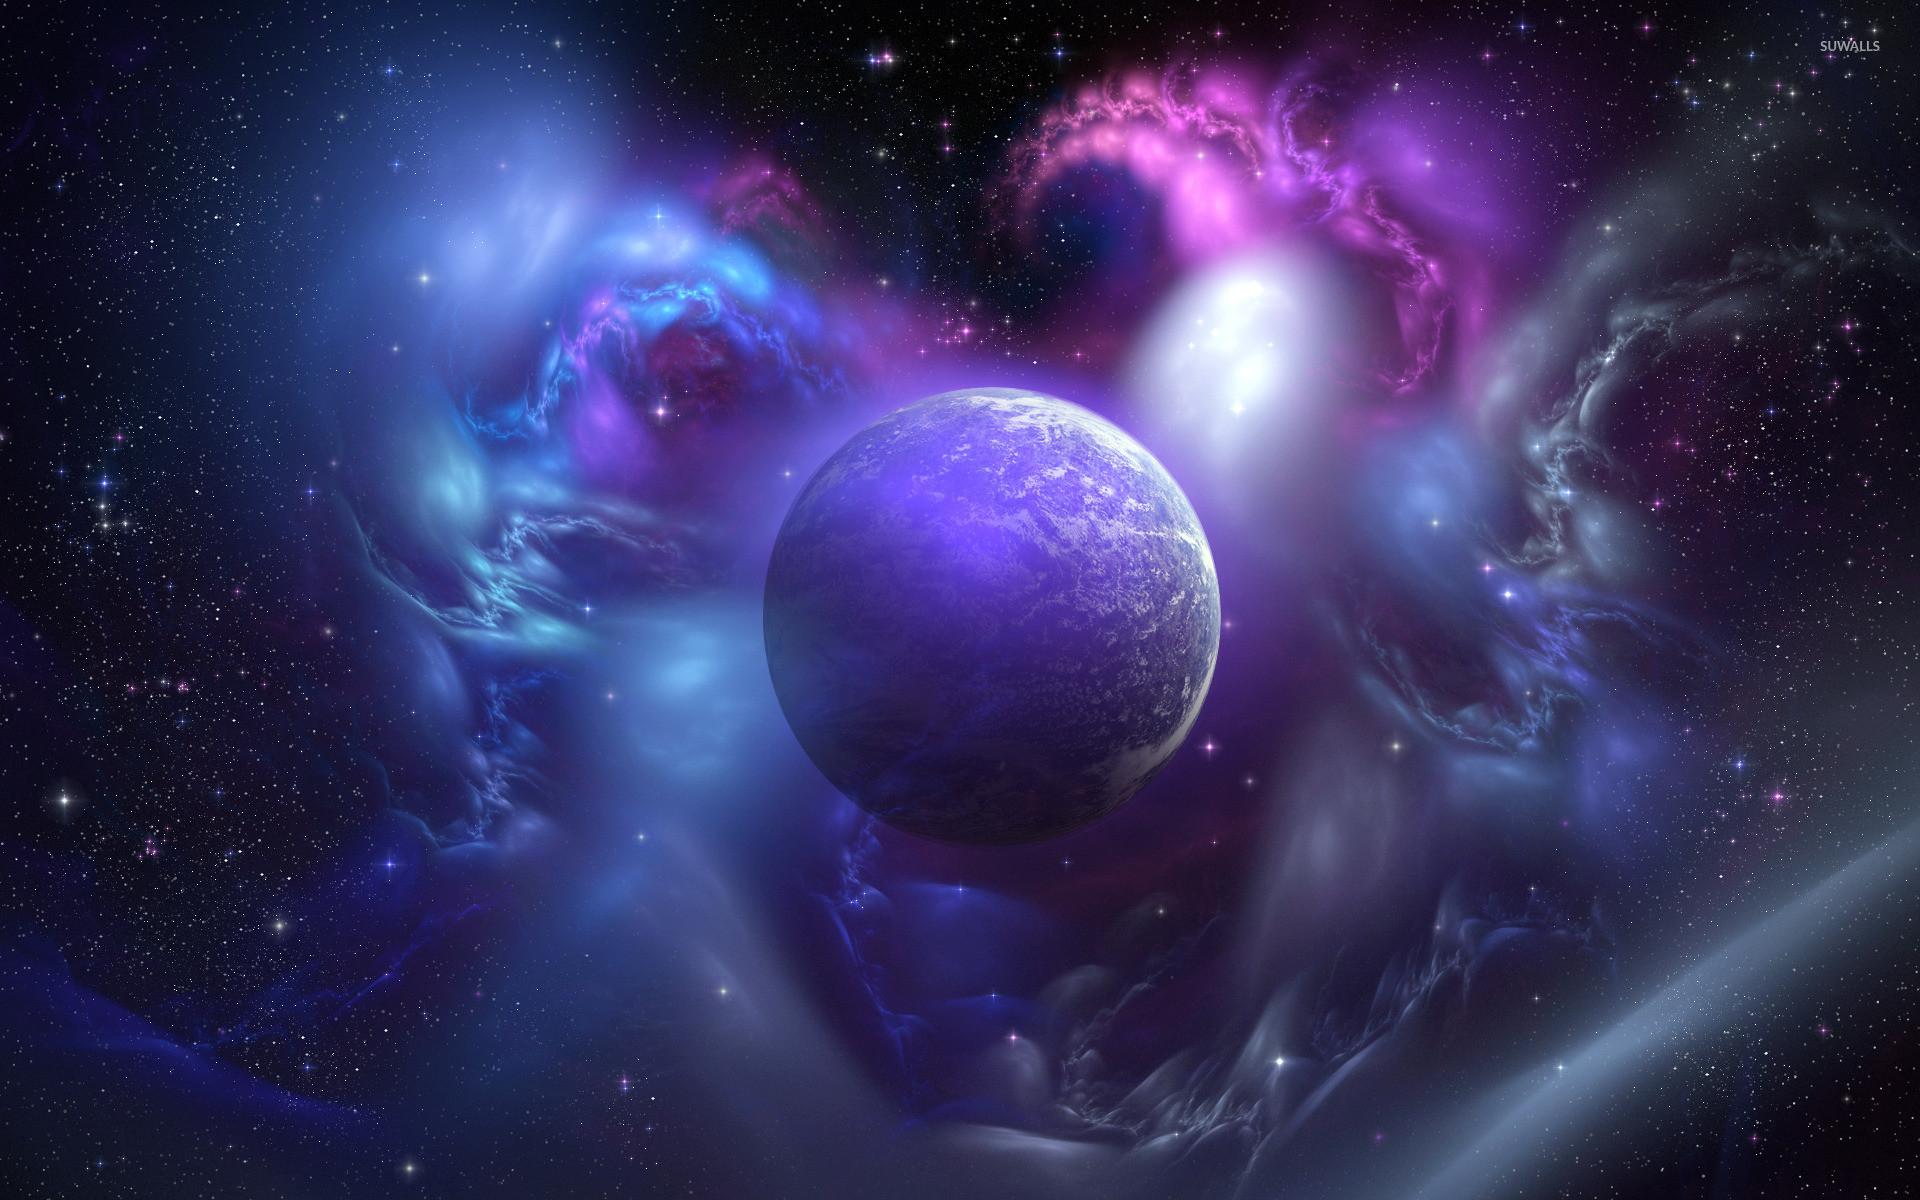 Nebula and planet wallpaper jpg